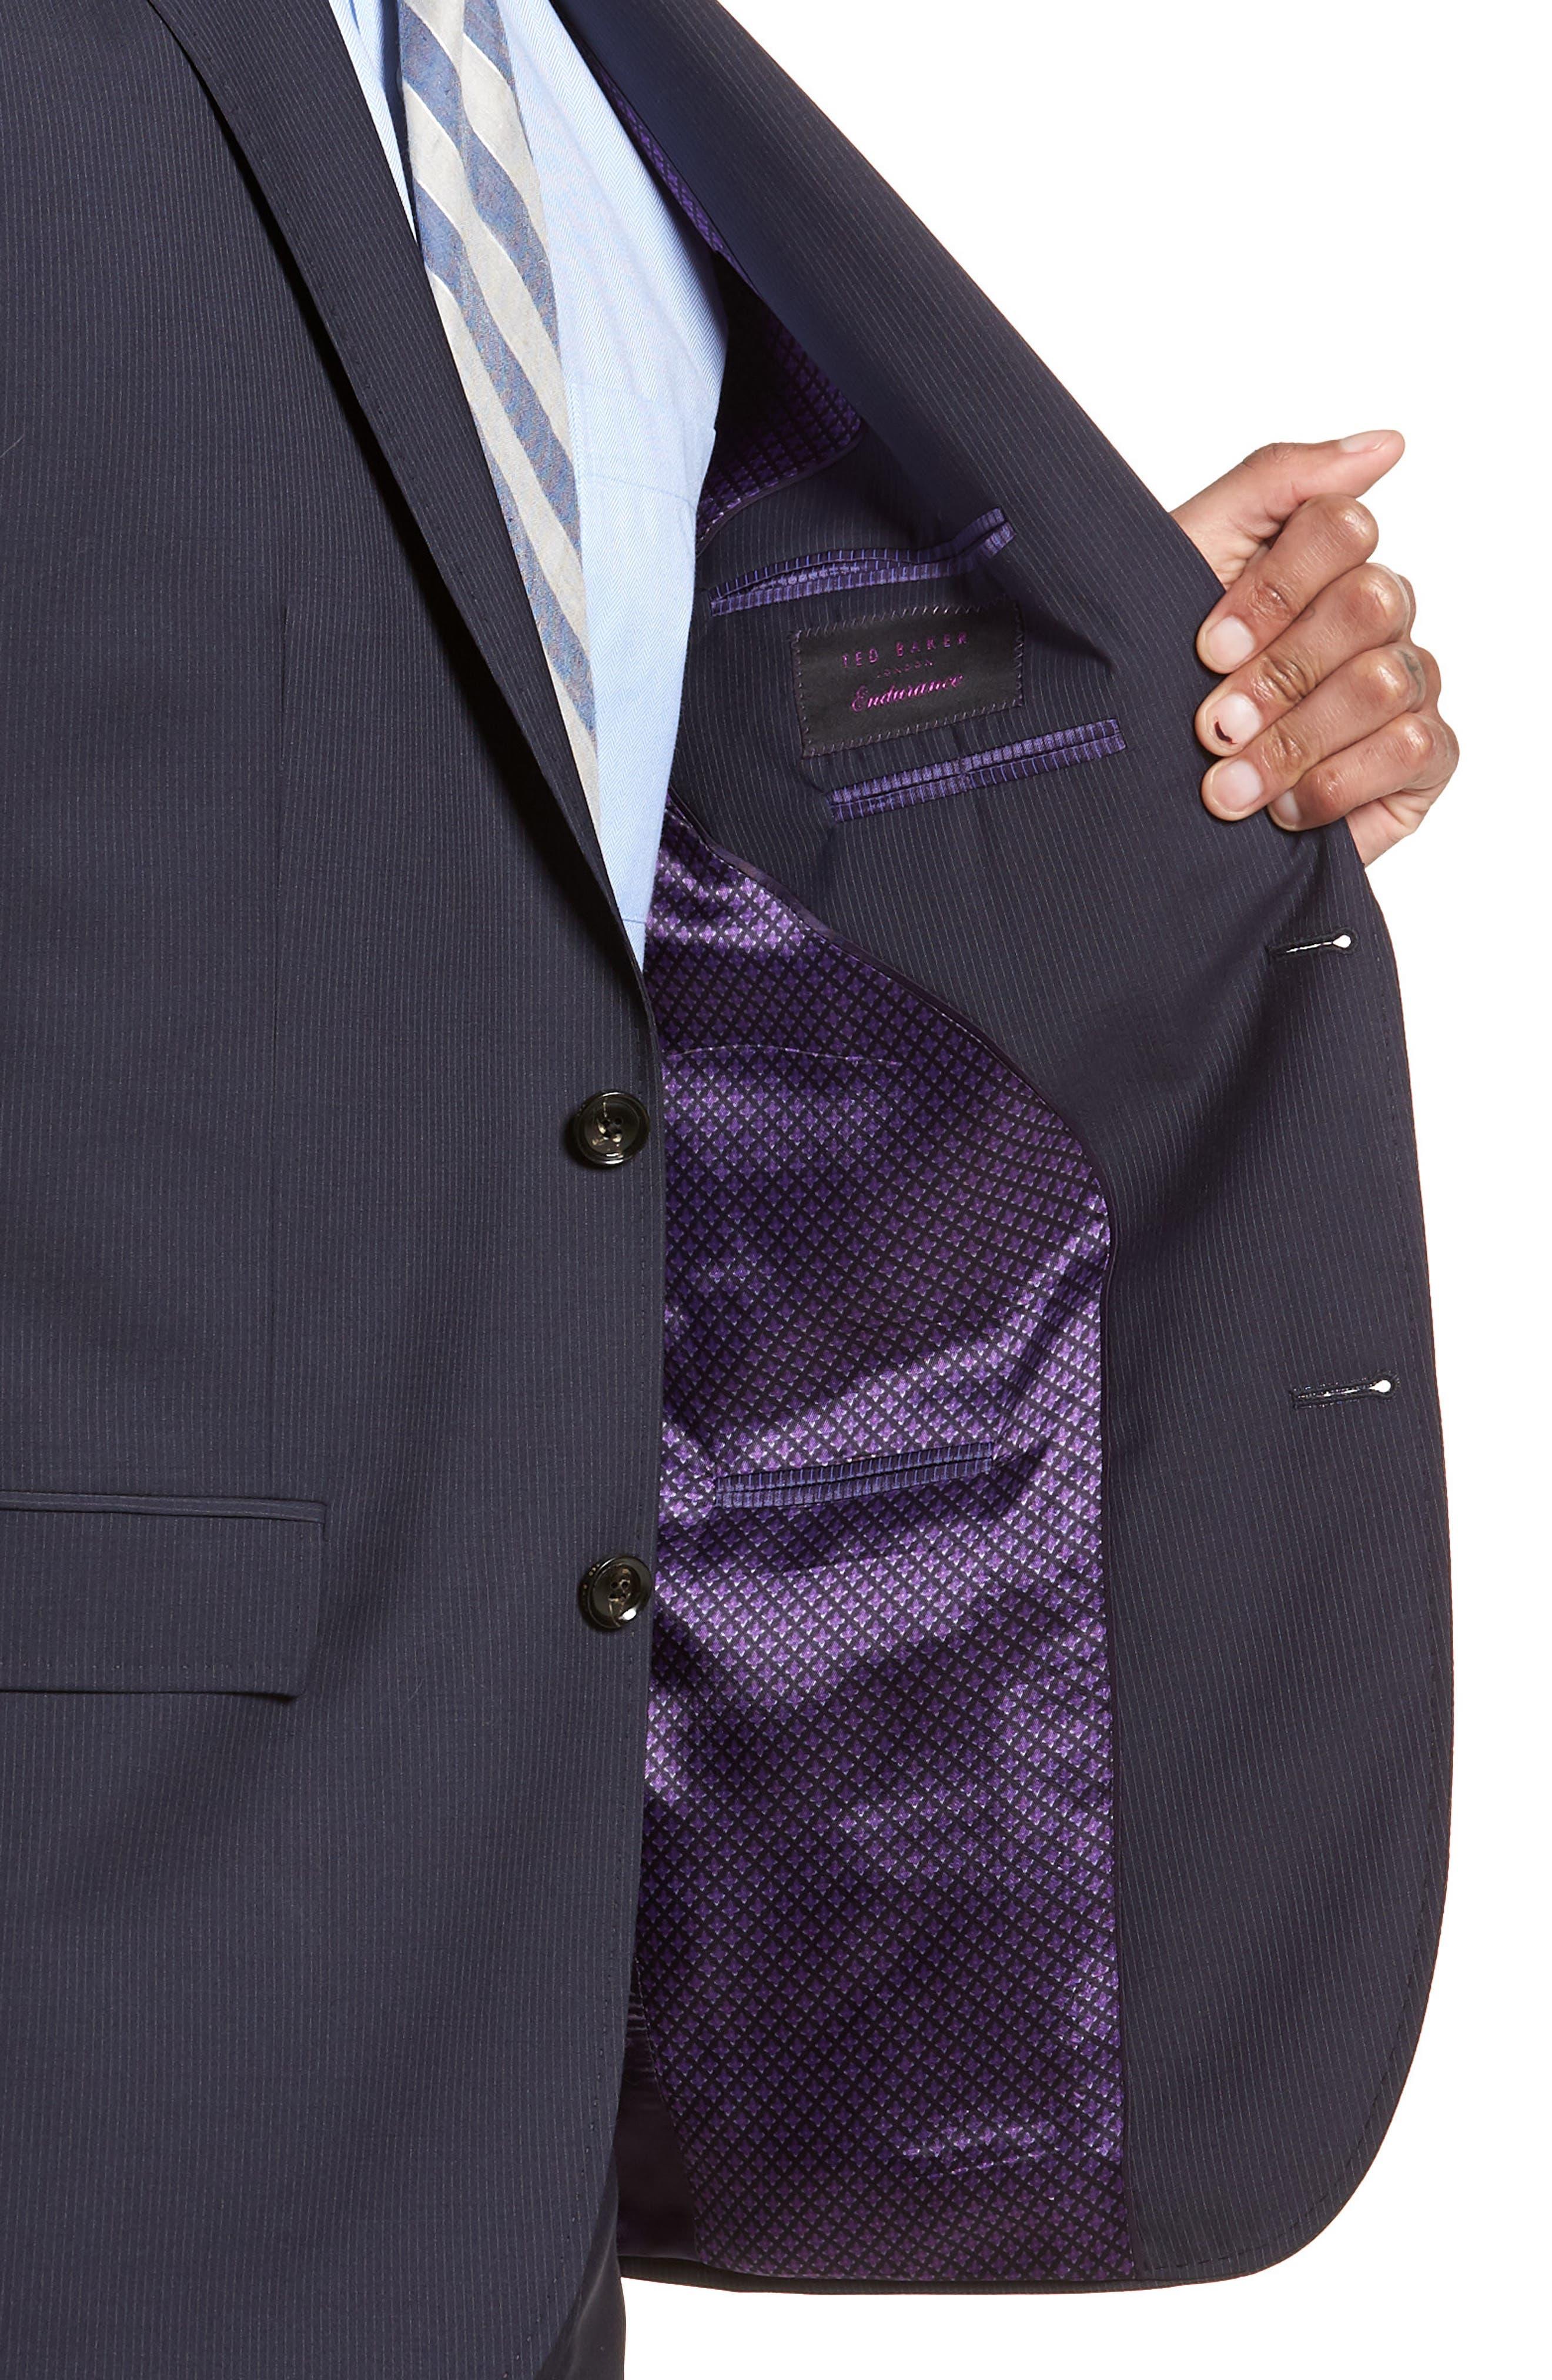 Jay Trim Fit Stripe Wool Suit,                             Alternate thumbnail 4, color,                             NAVY